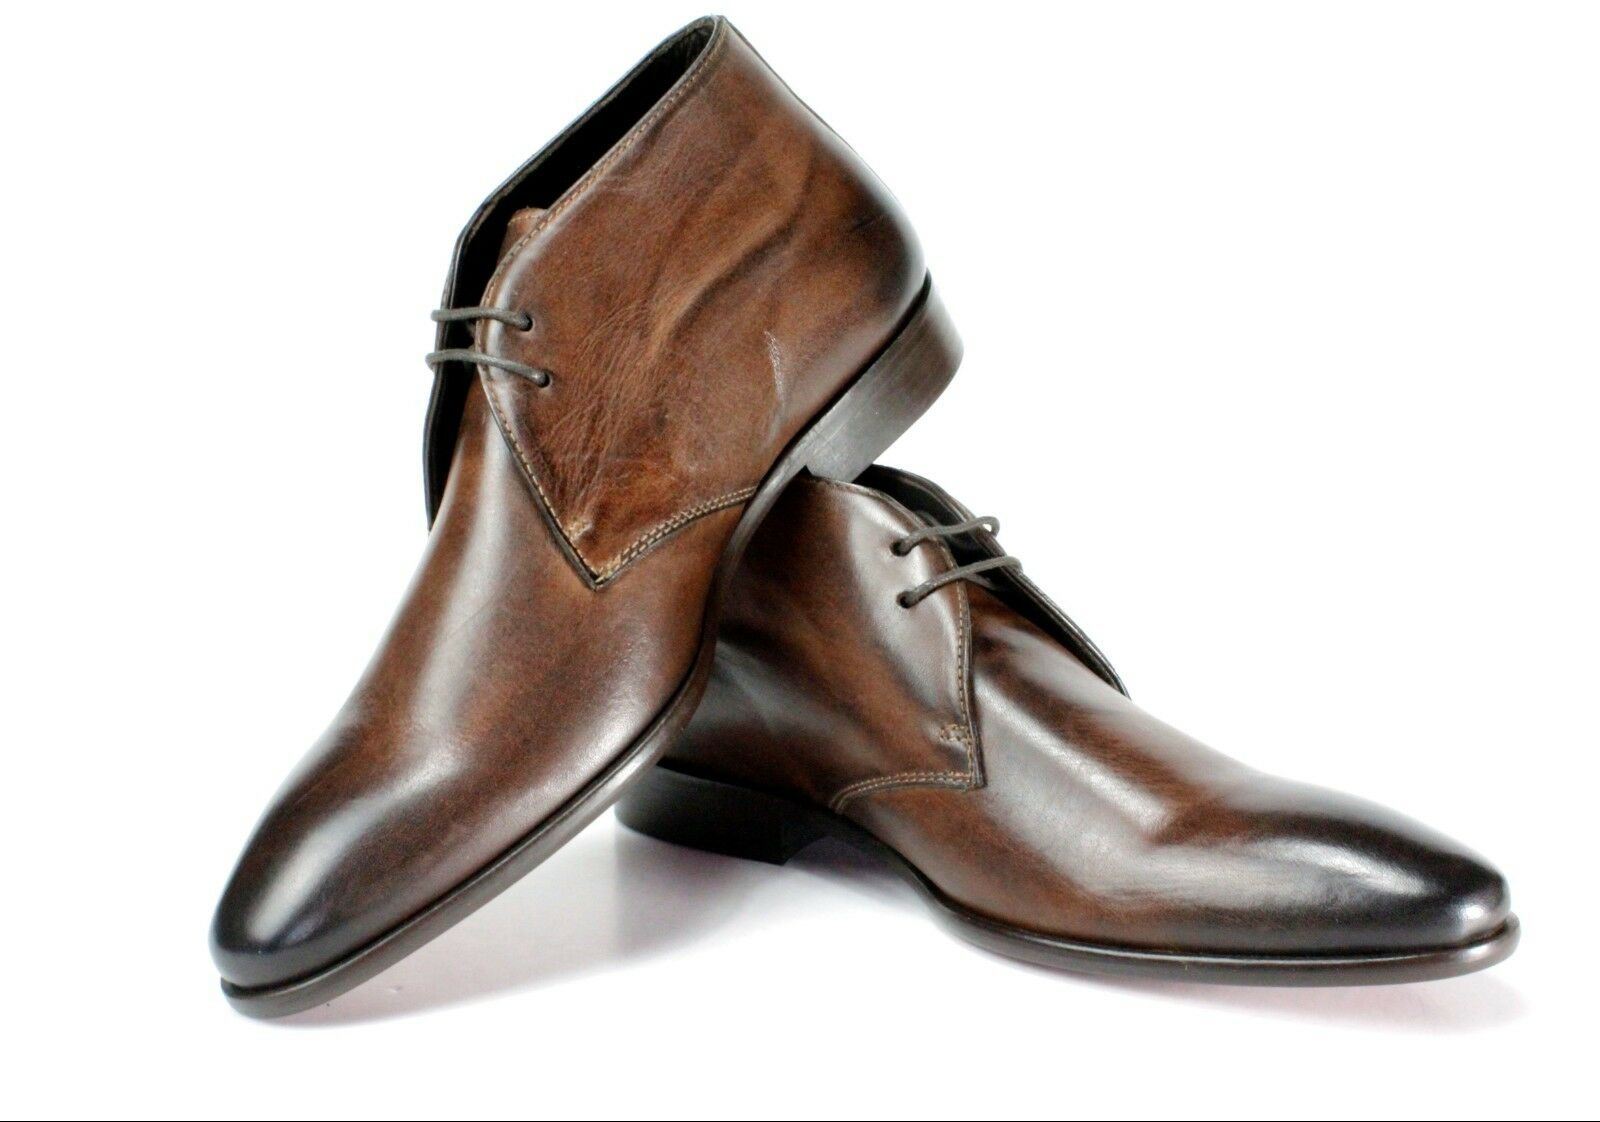 IVAN TROY Abou Marroneee avvio Handmade Men Italian Leather Dress avvio Ankle stivali